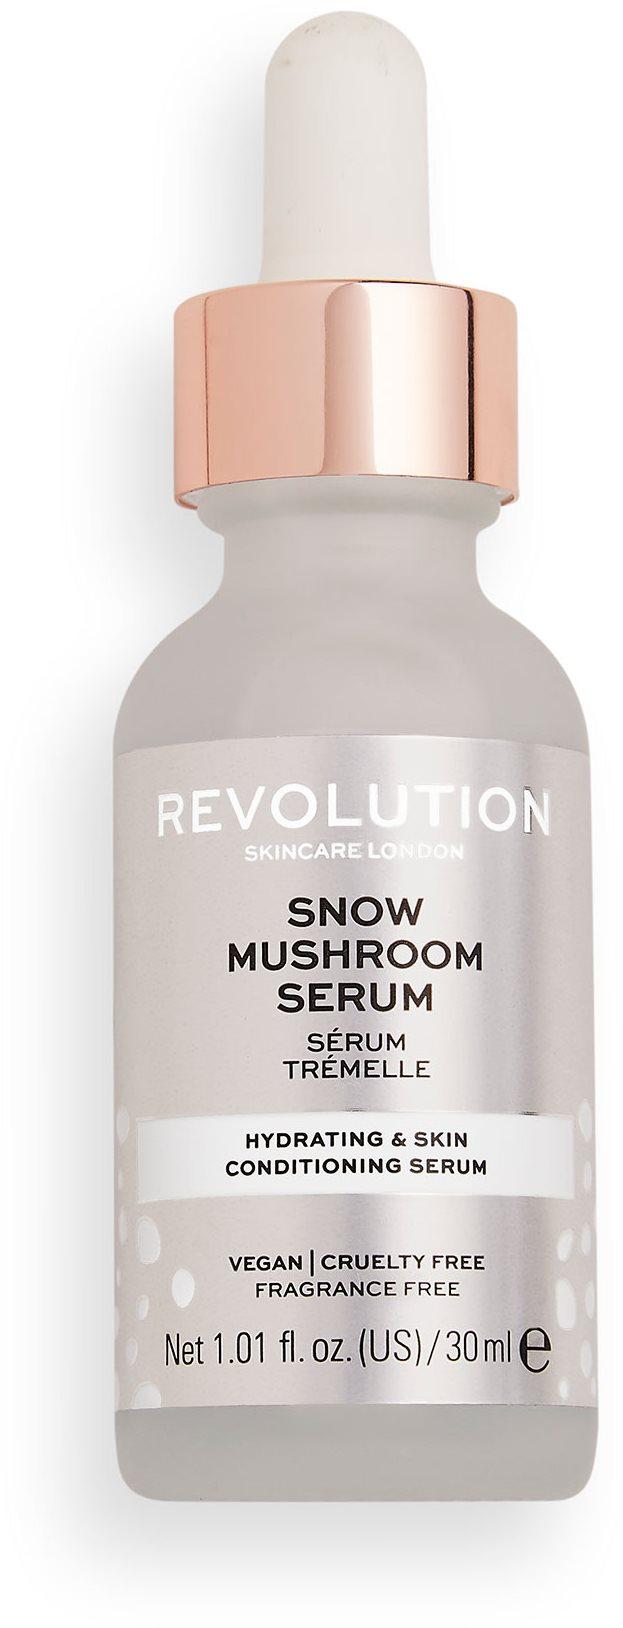 REVOLUTION SKINCARE Snow Mushroom Serum 30 ml